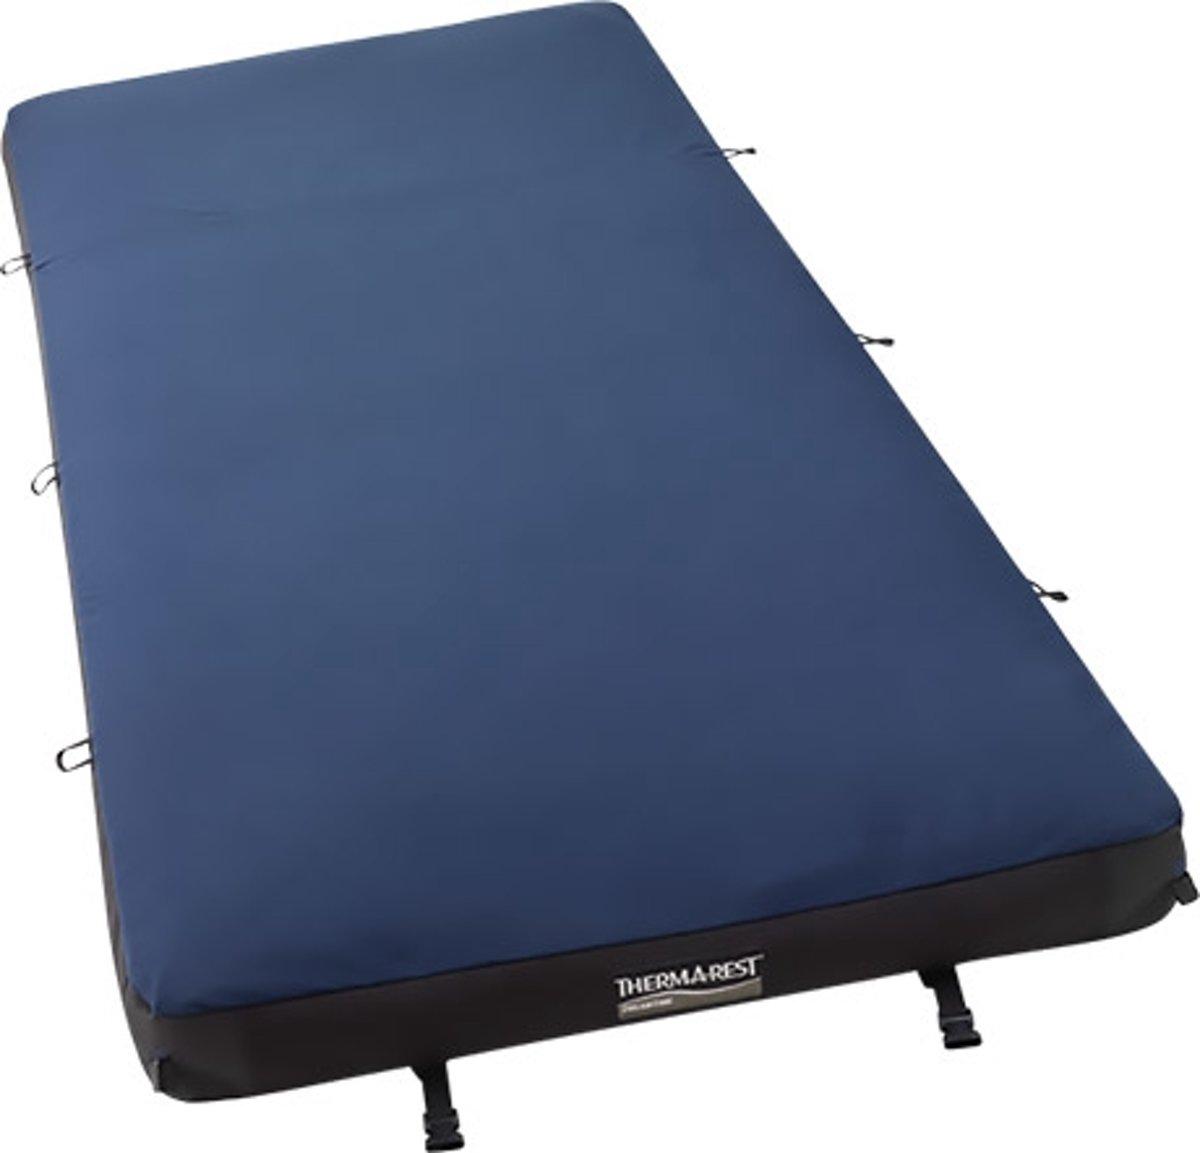 Therm-a-Rest DreamTime Slaapmat XL - blauw kopen